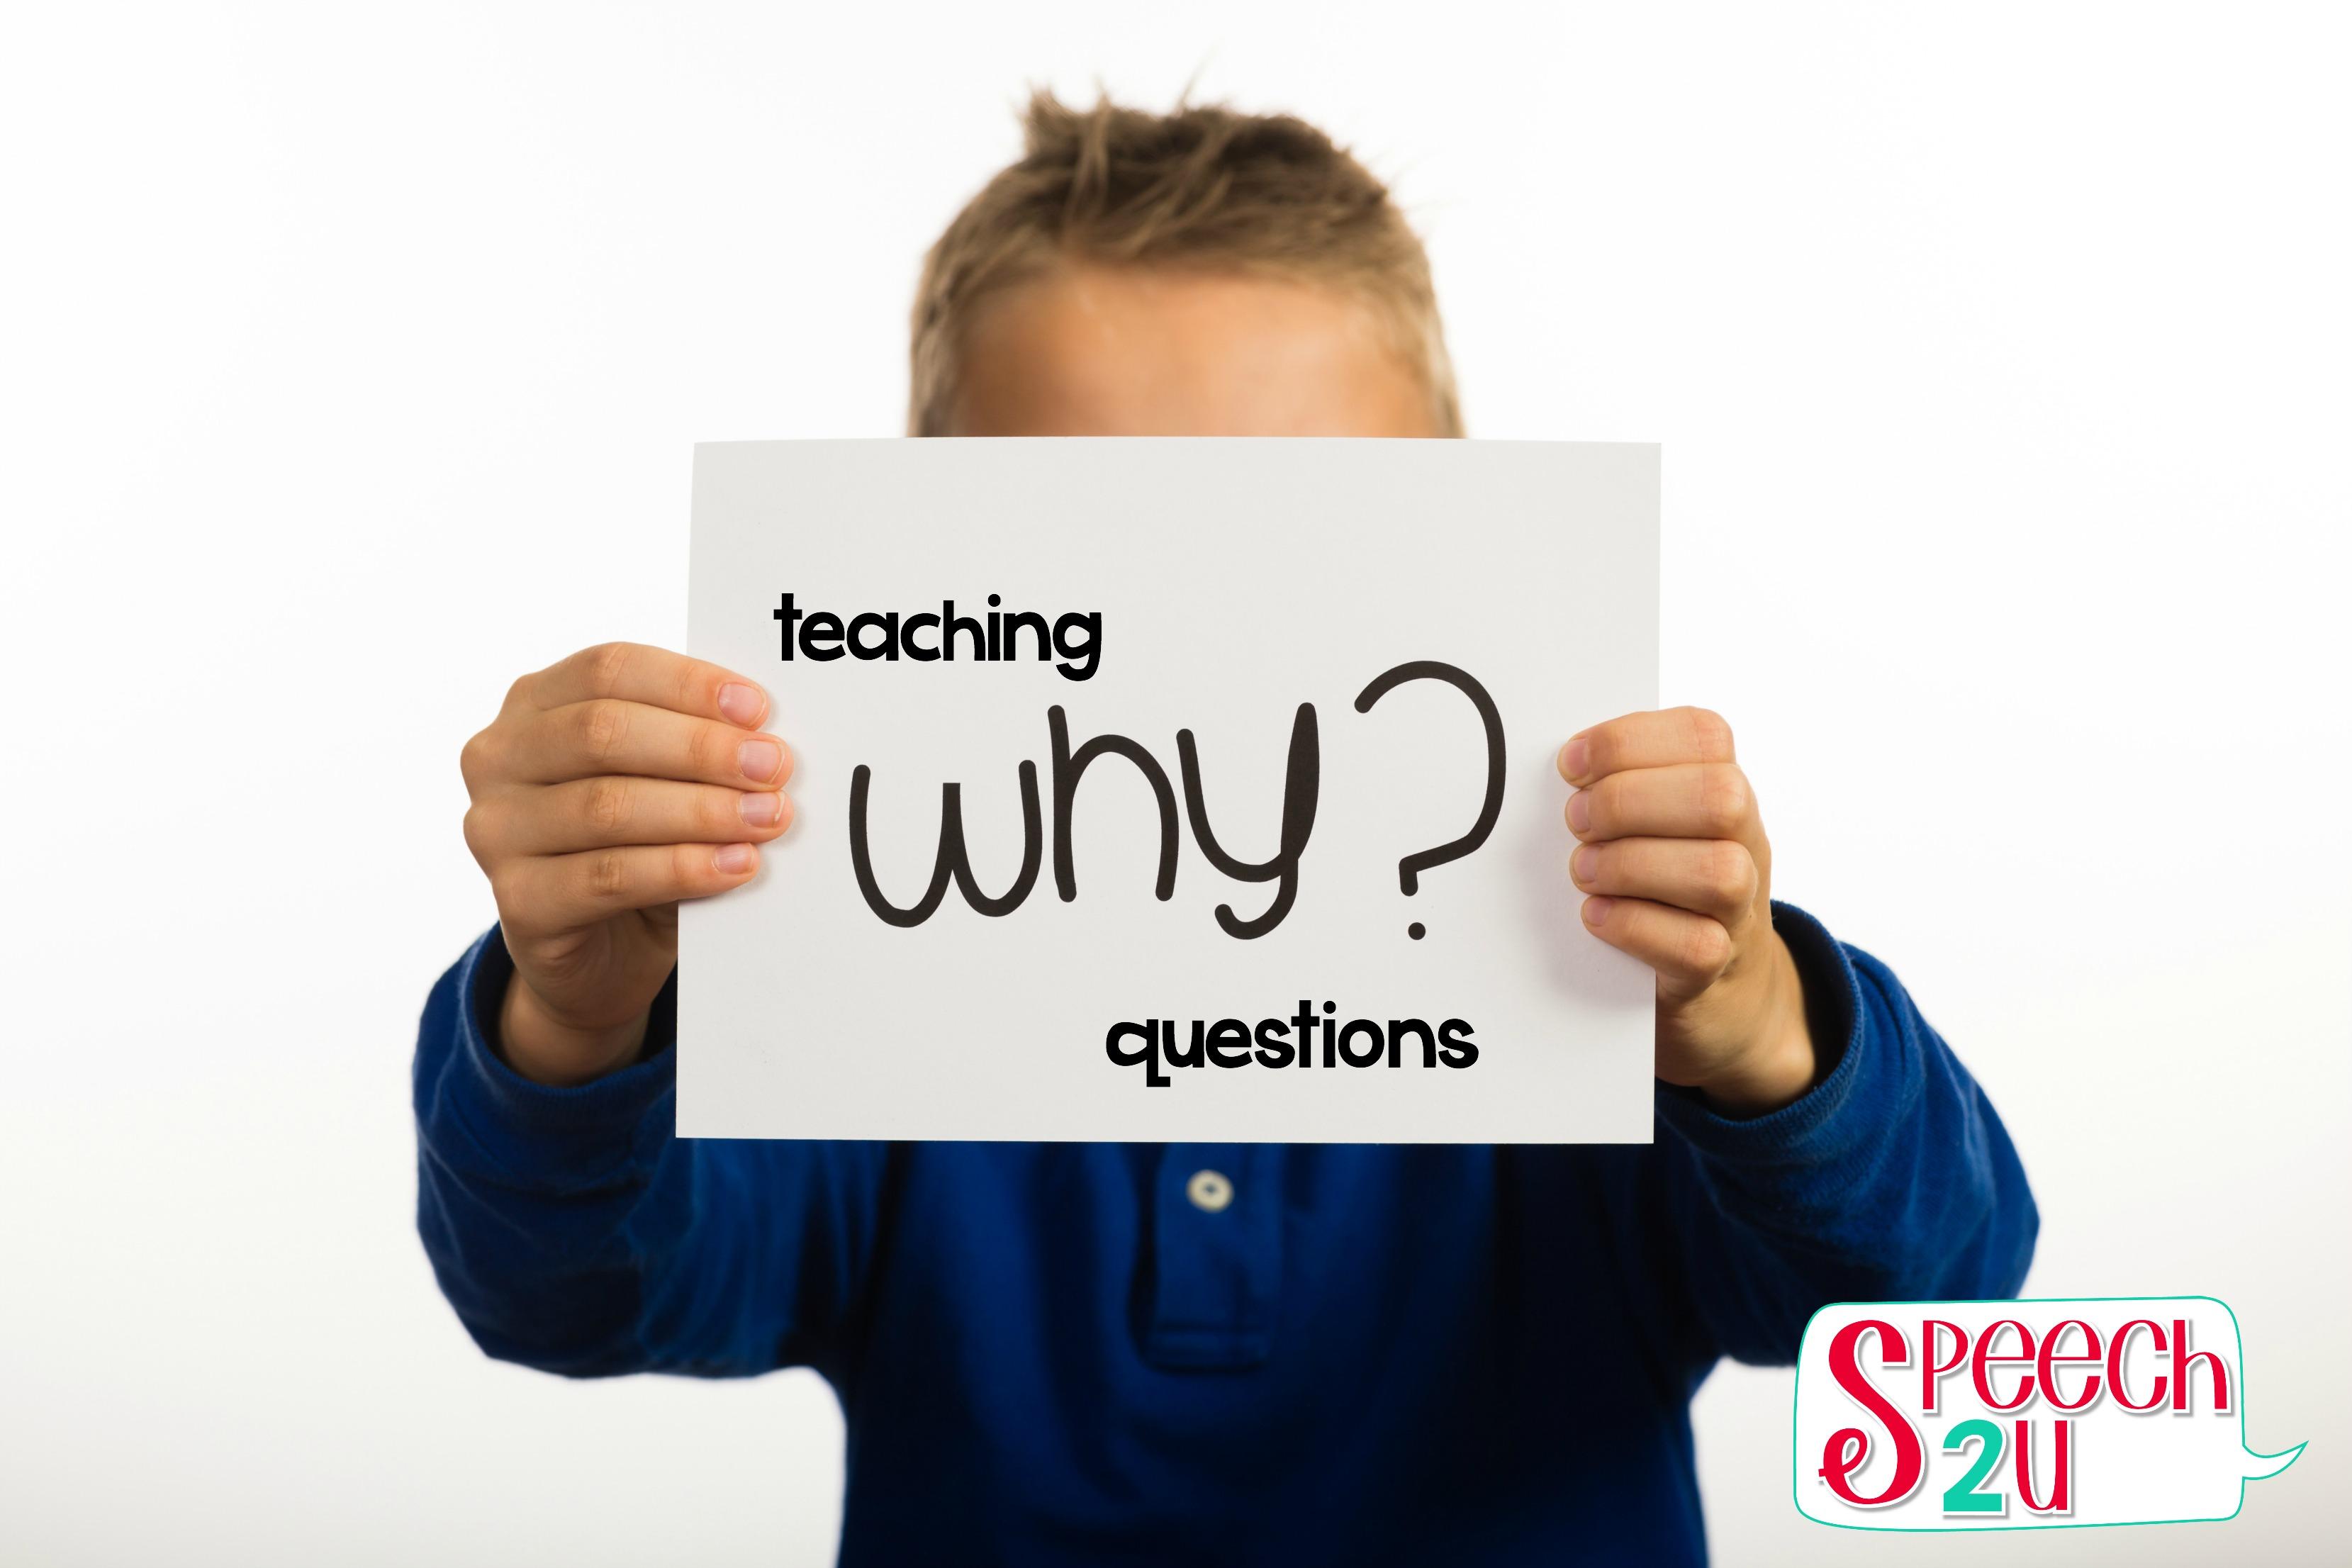 Teaching WHY questions - Speech 2U